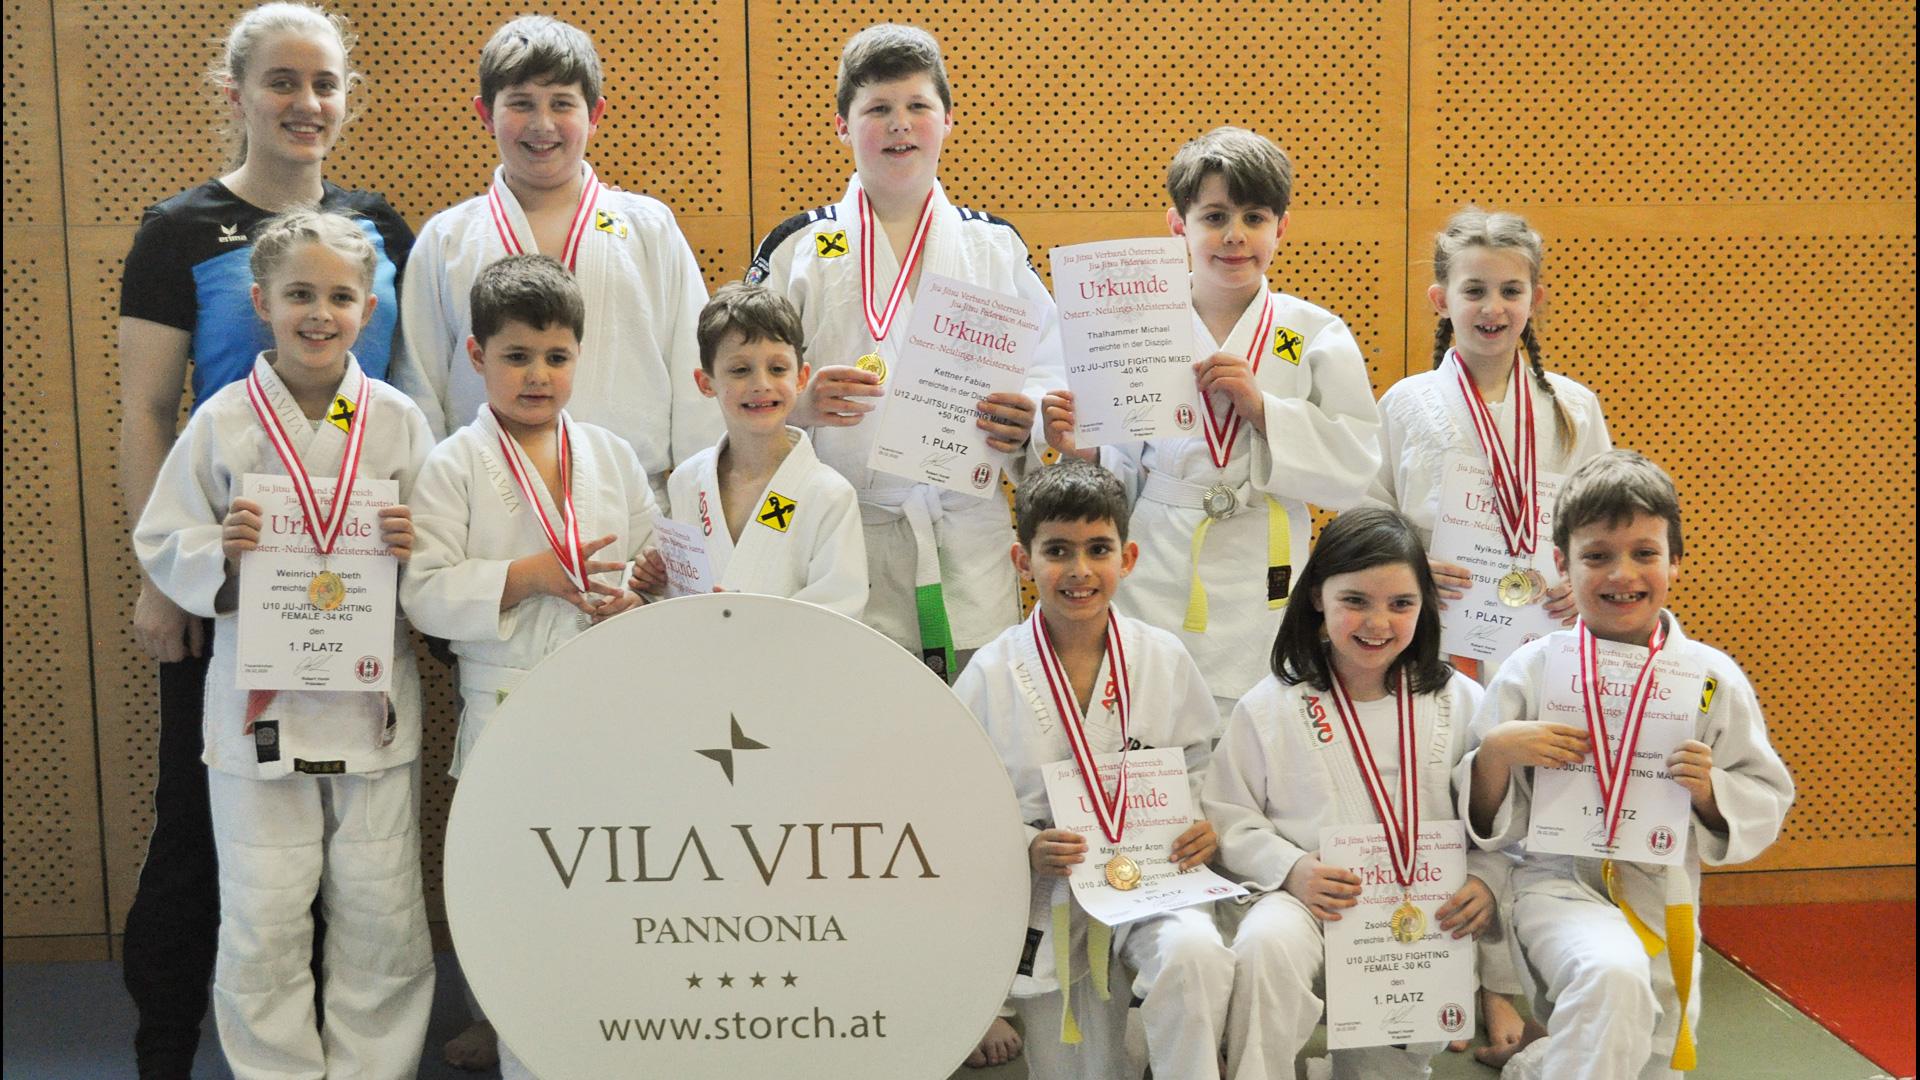 Neulingsmeisterschaften | JiuJitsu | Frauenkirchen | KämpferInnen JiuJitsu Club Vila Vita Pannonia